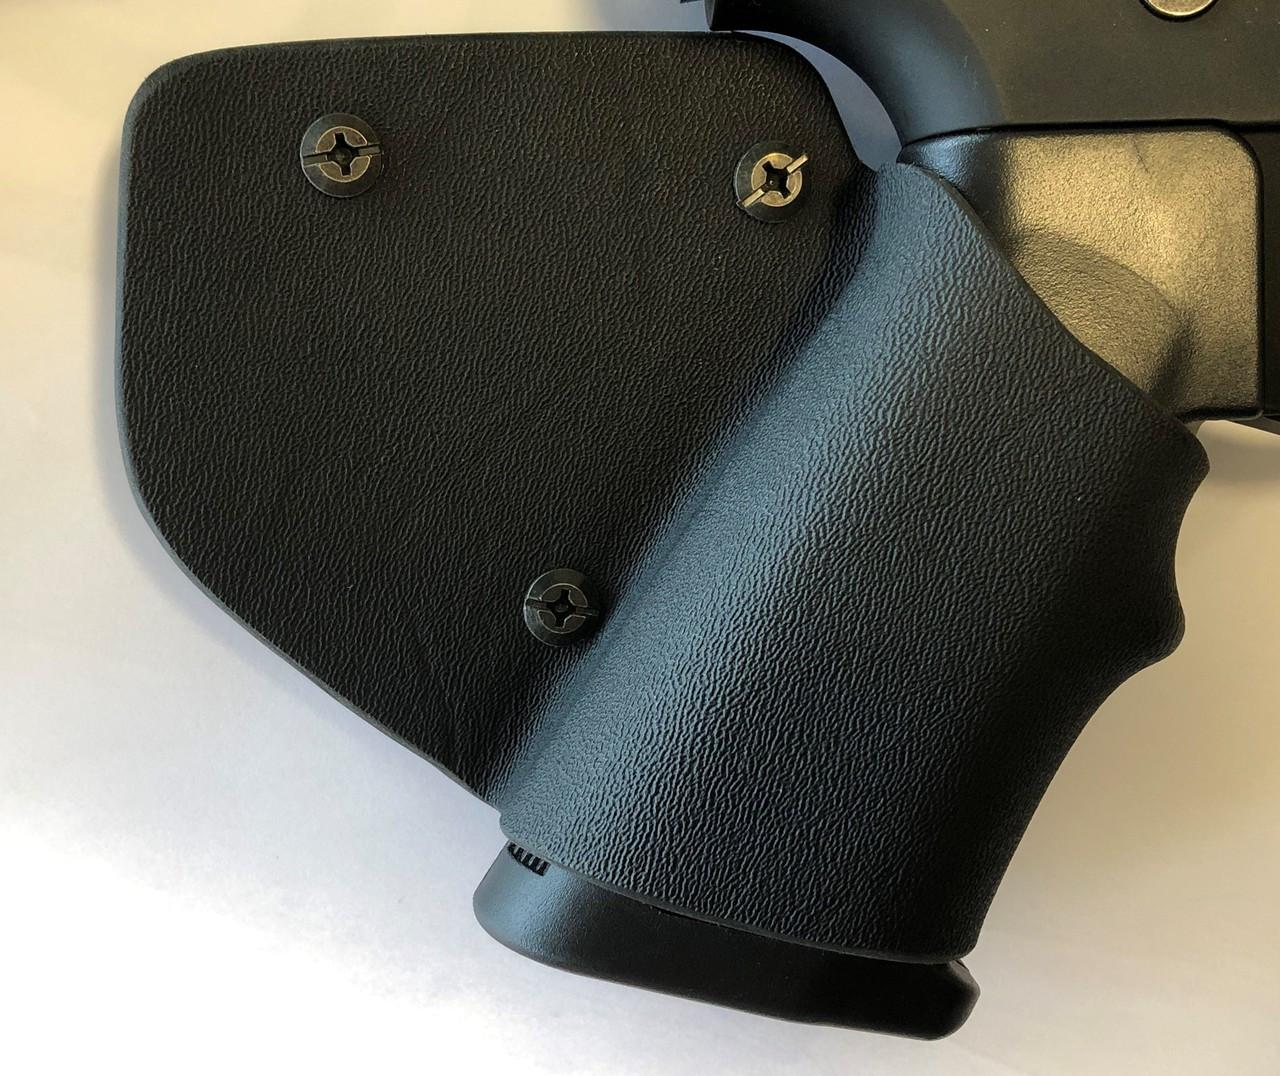 Kel Tec Sub2000 Gen 2(Glock 23)- CALIFORNIA LEGAL - .40S&W-1